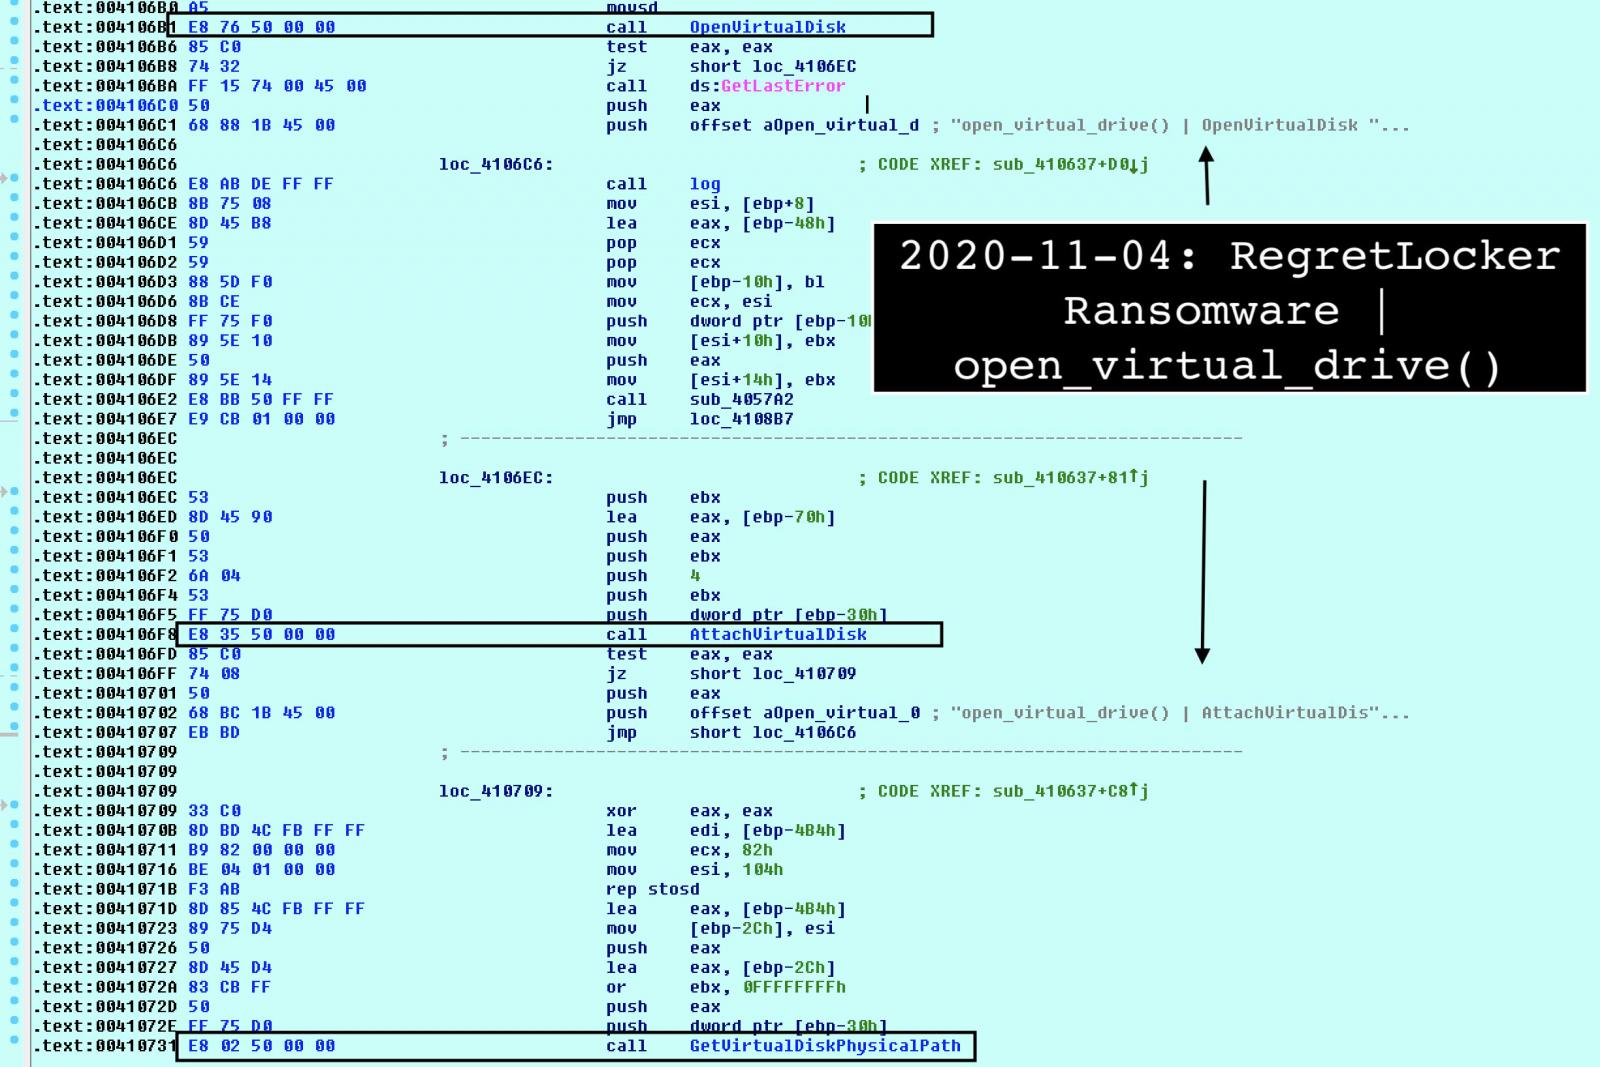 Montaje de un archivo VHD